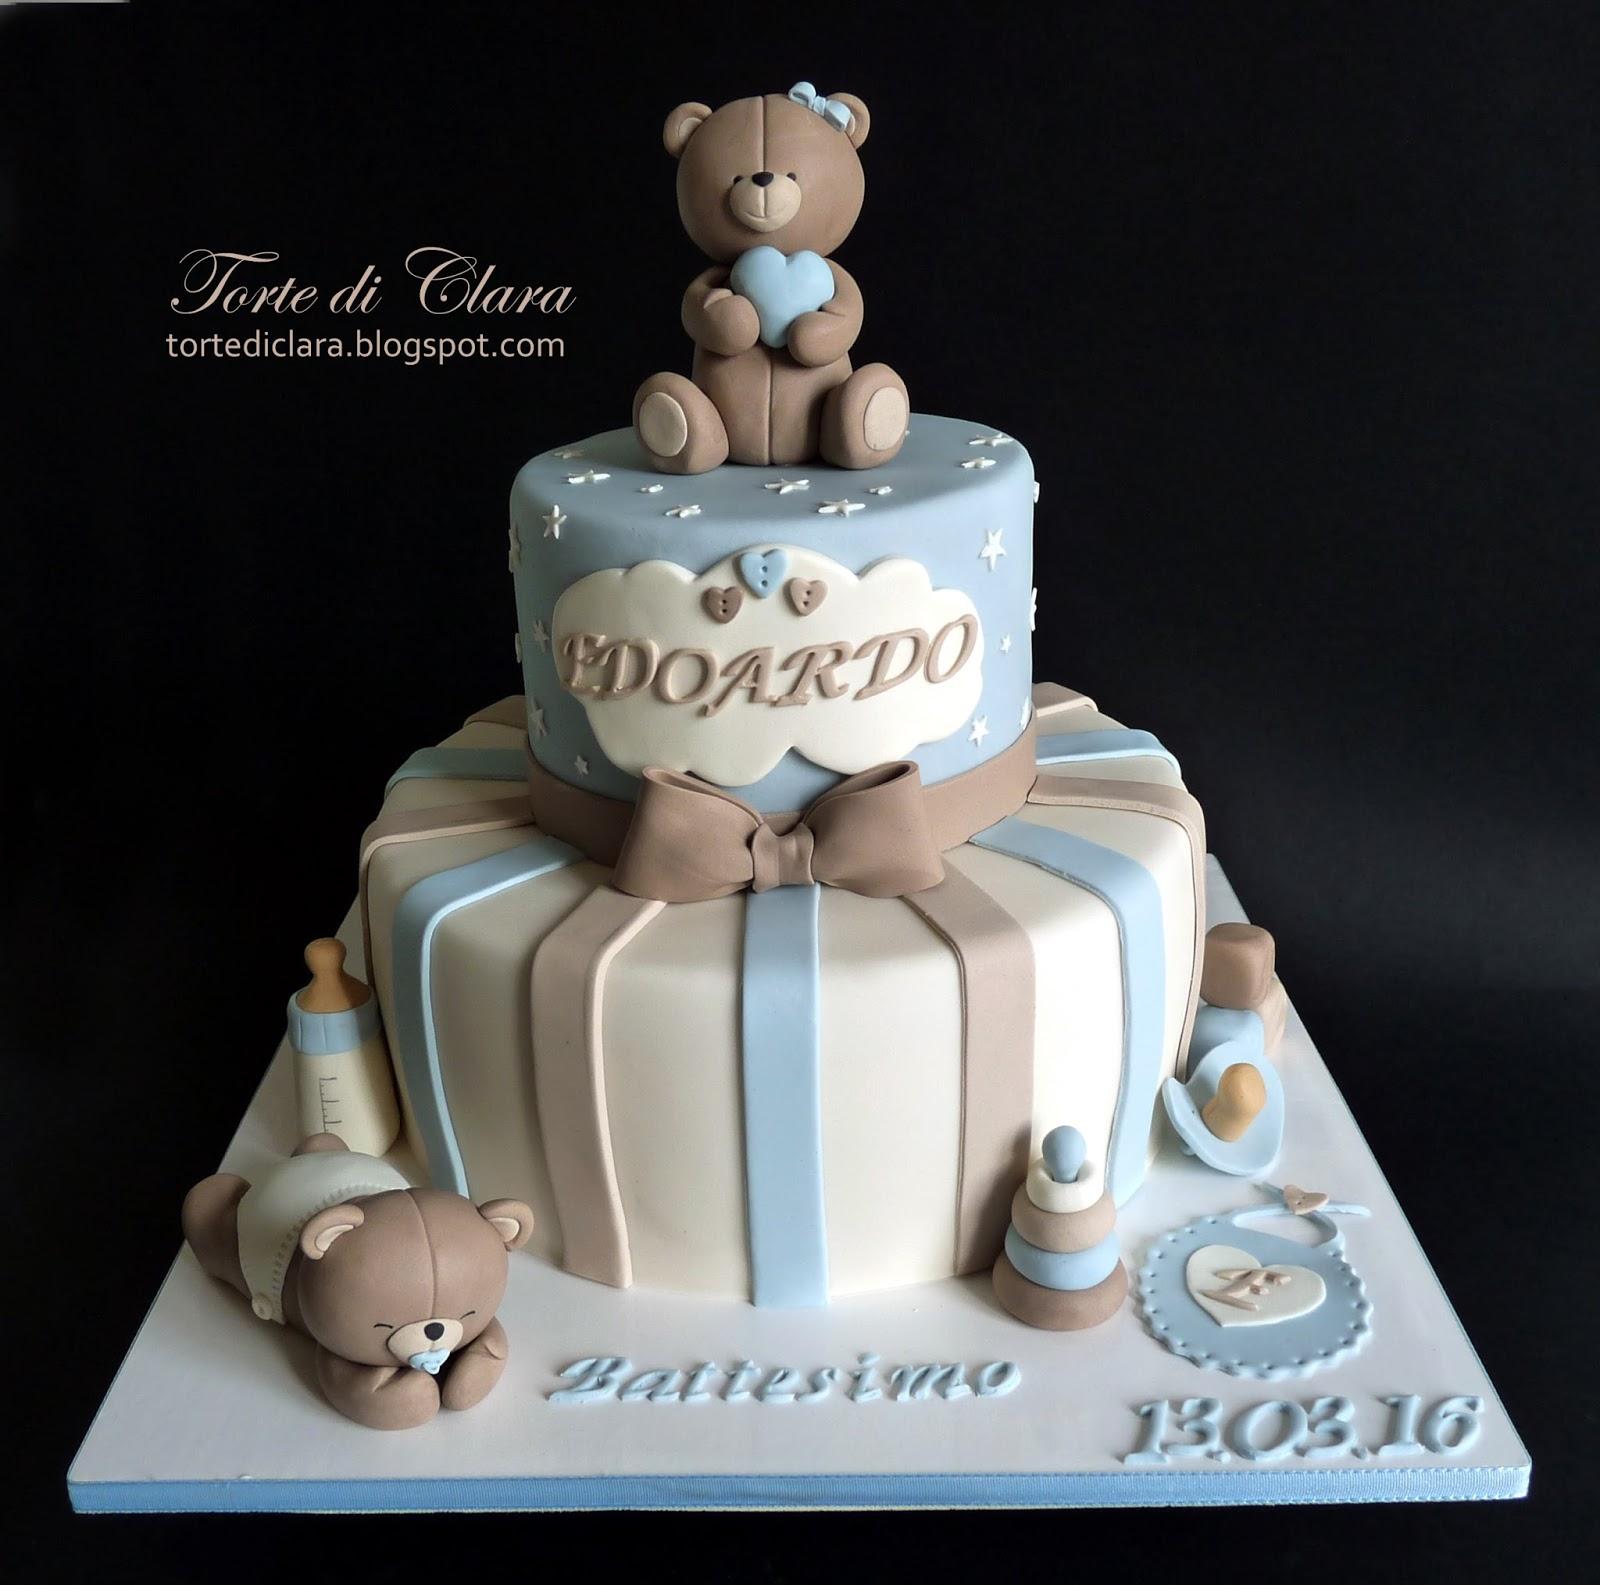 Bien-aimé Torte di Clara: Torta Battesimo (17) ZR95